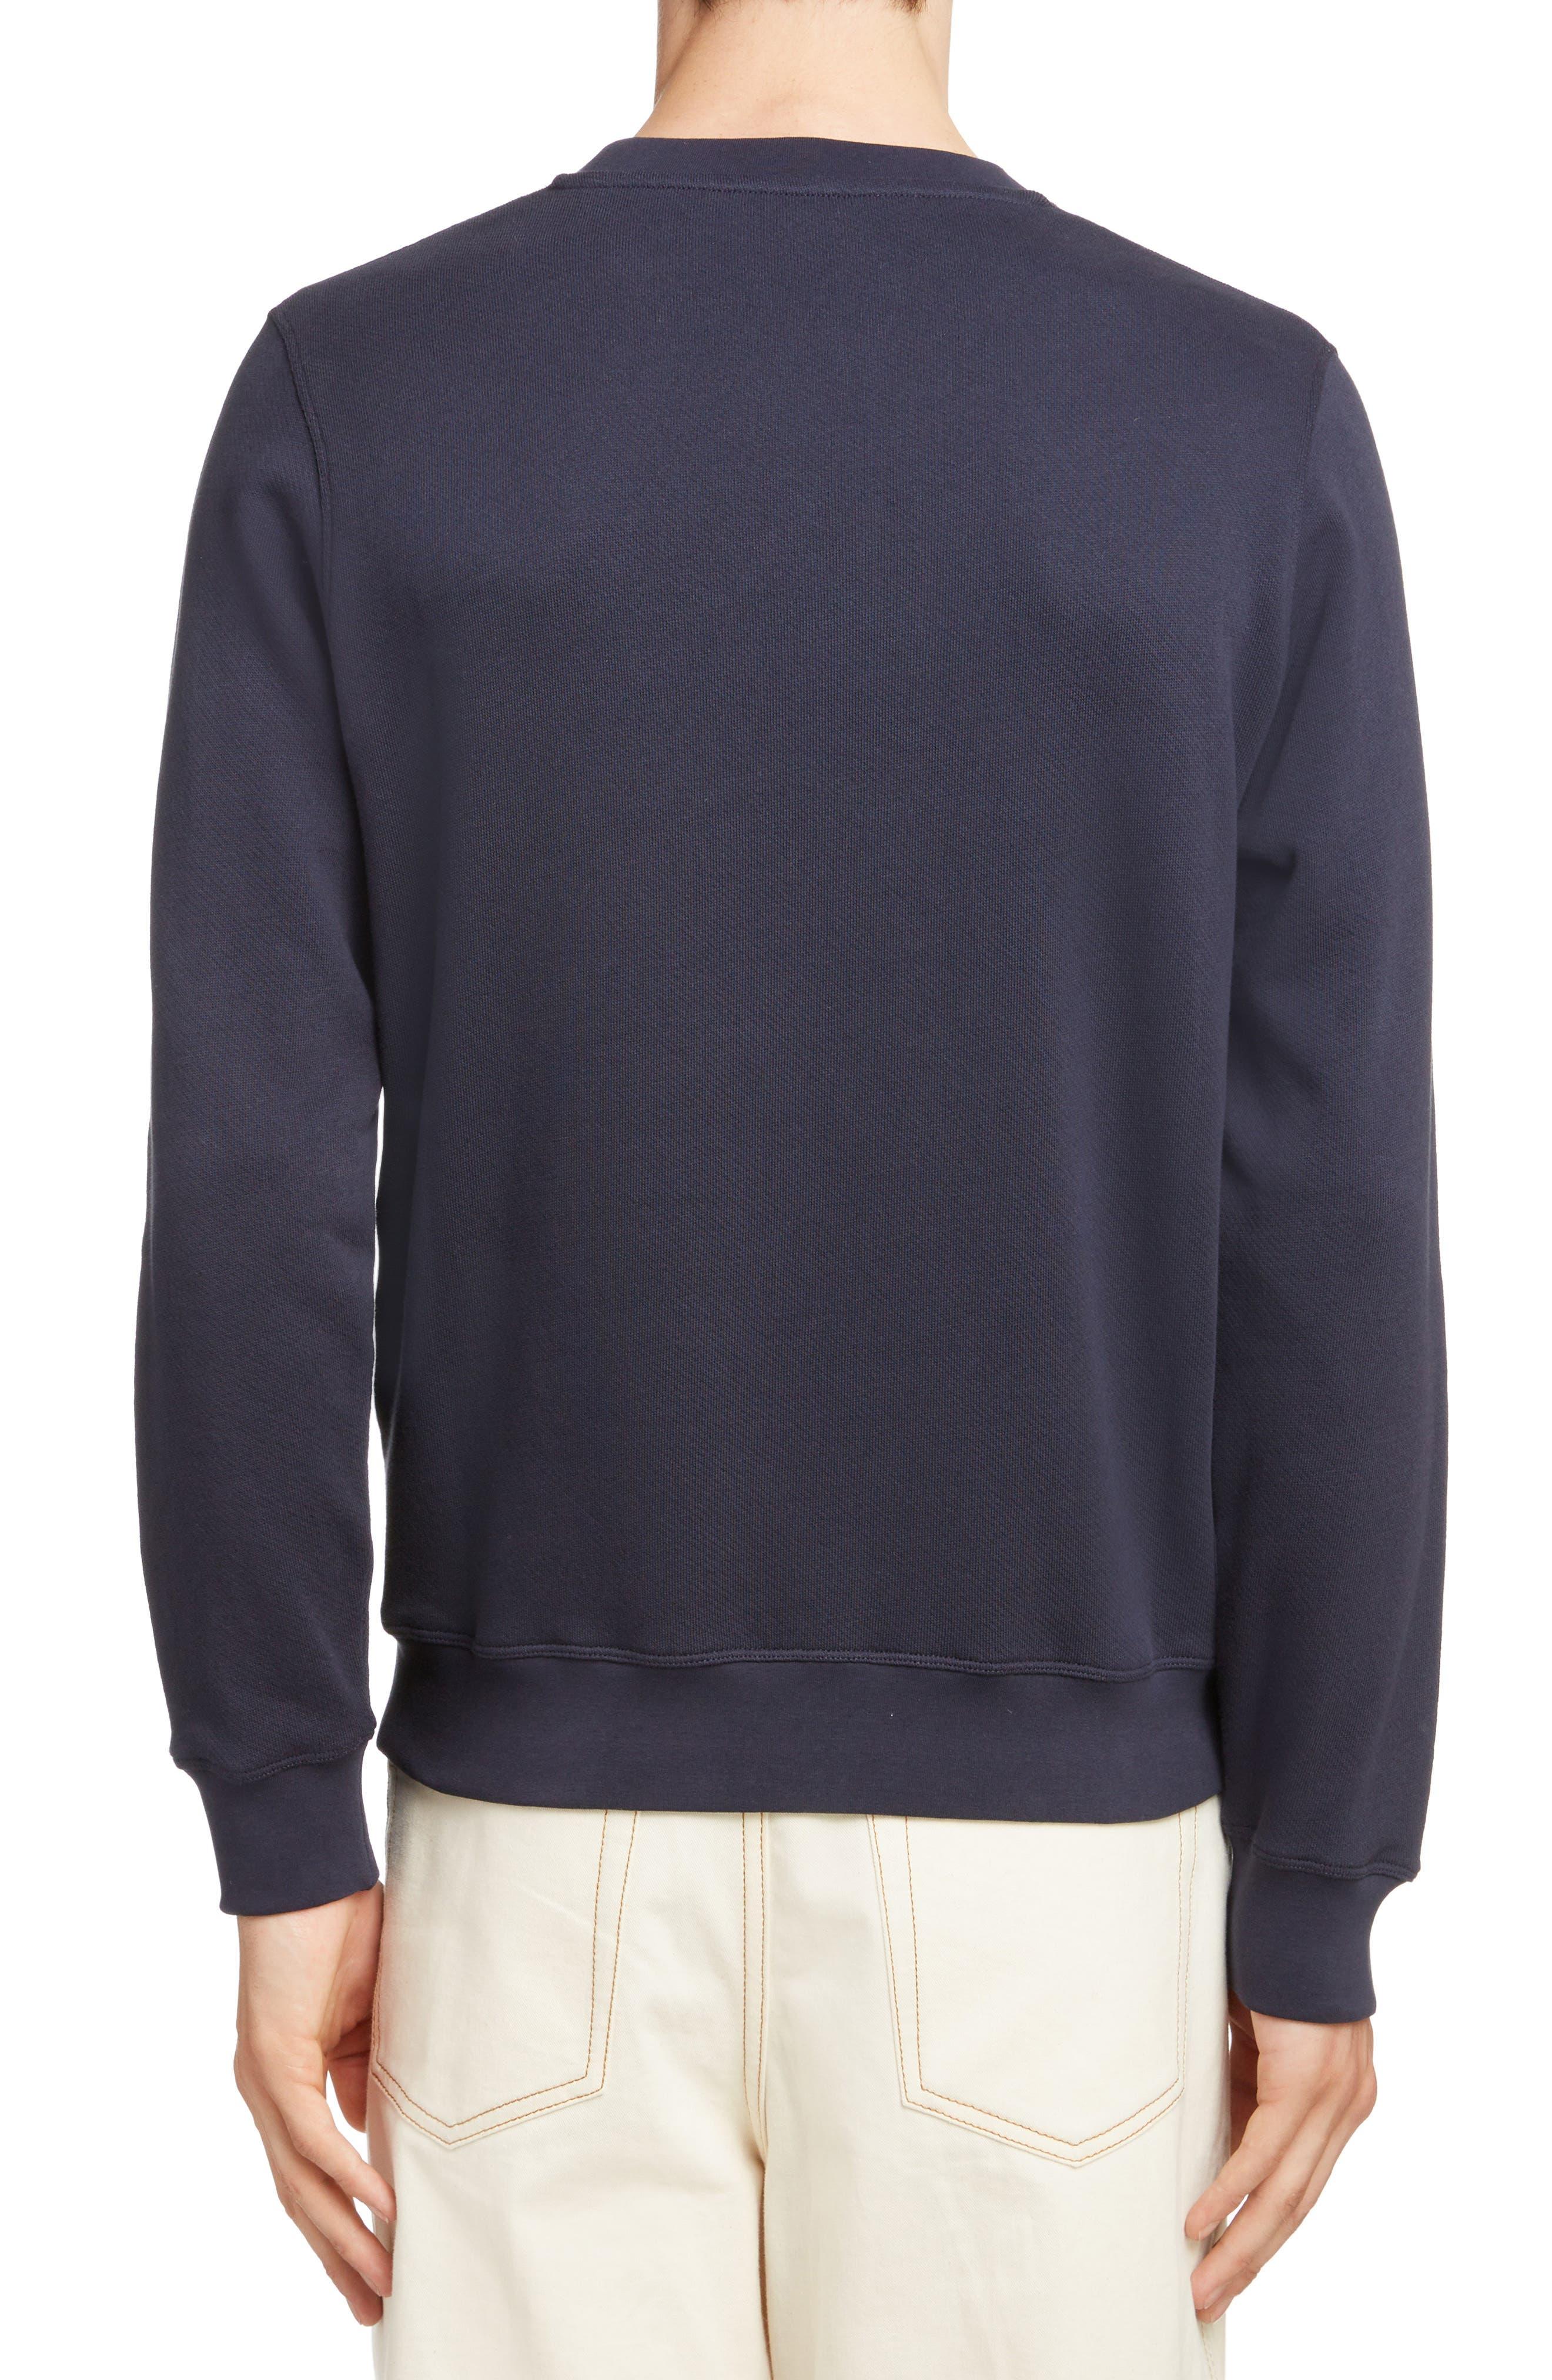 Anagram Sweatshirt,                             Alternate thumbnail 2, color,                             5387-NAVY BLUE/ MULTICOLOR